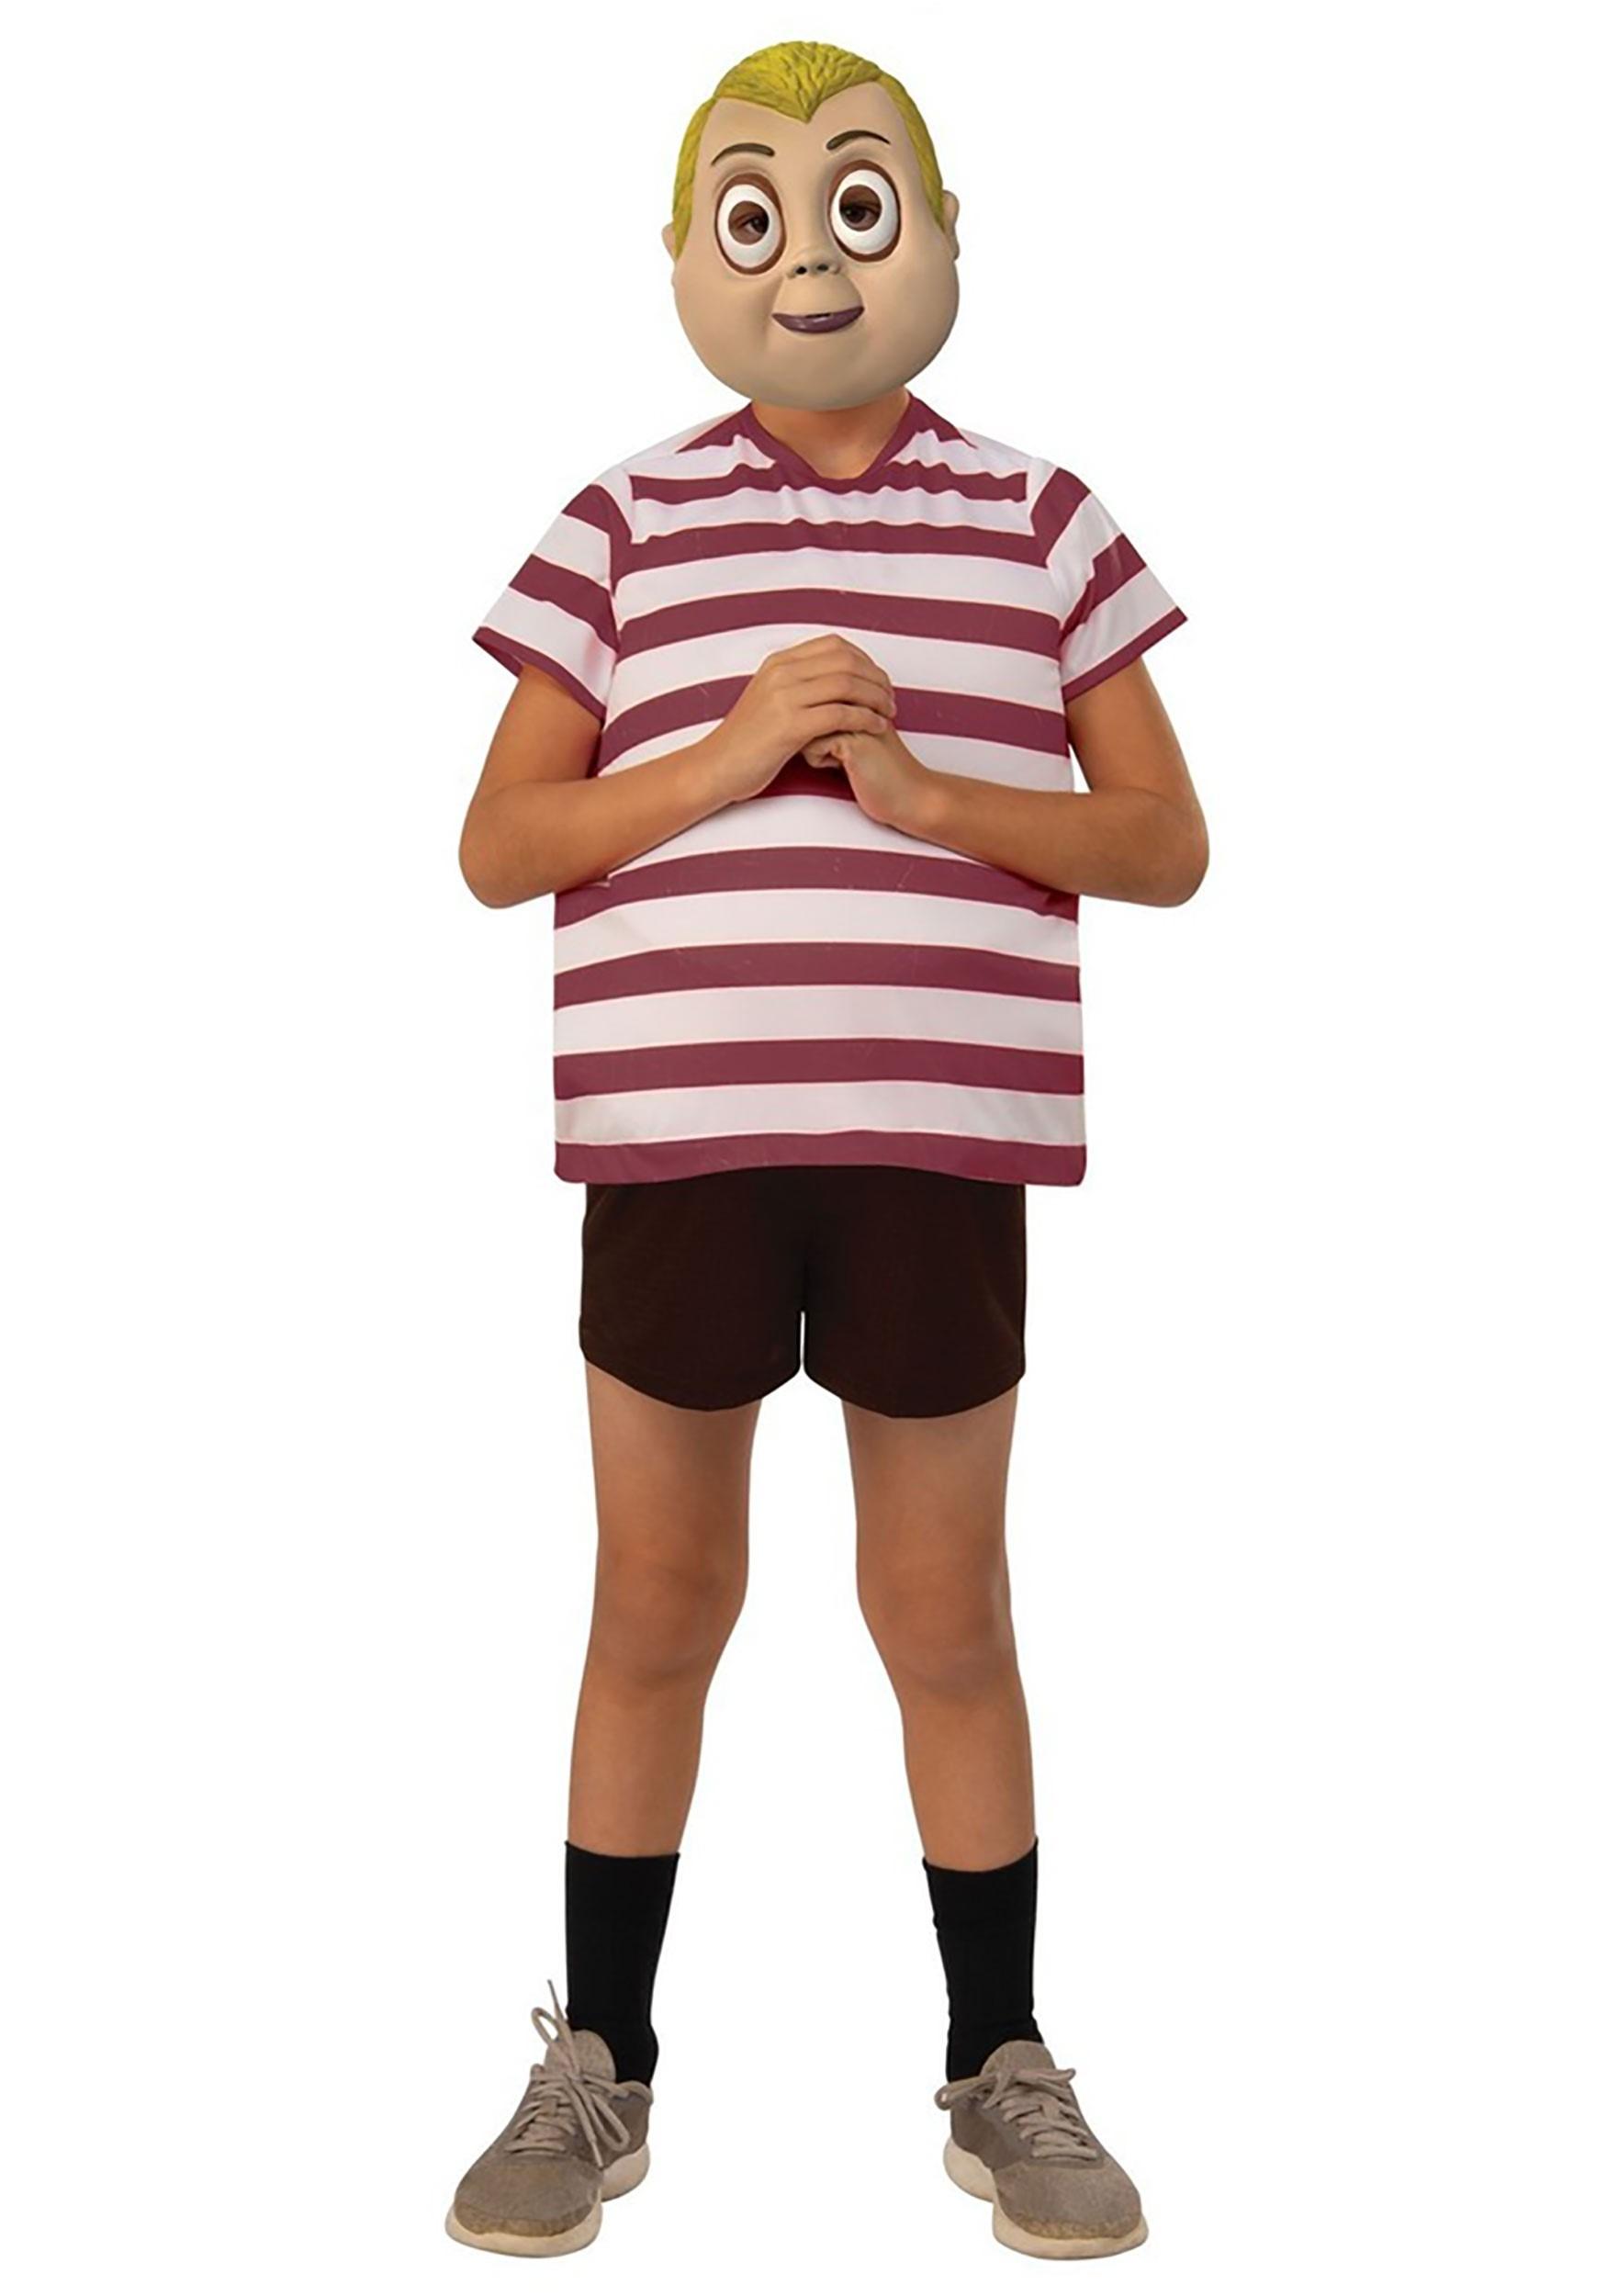 Addams Family Pugsley Costume